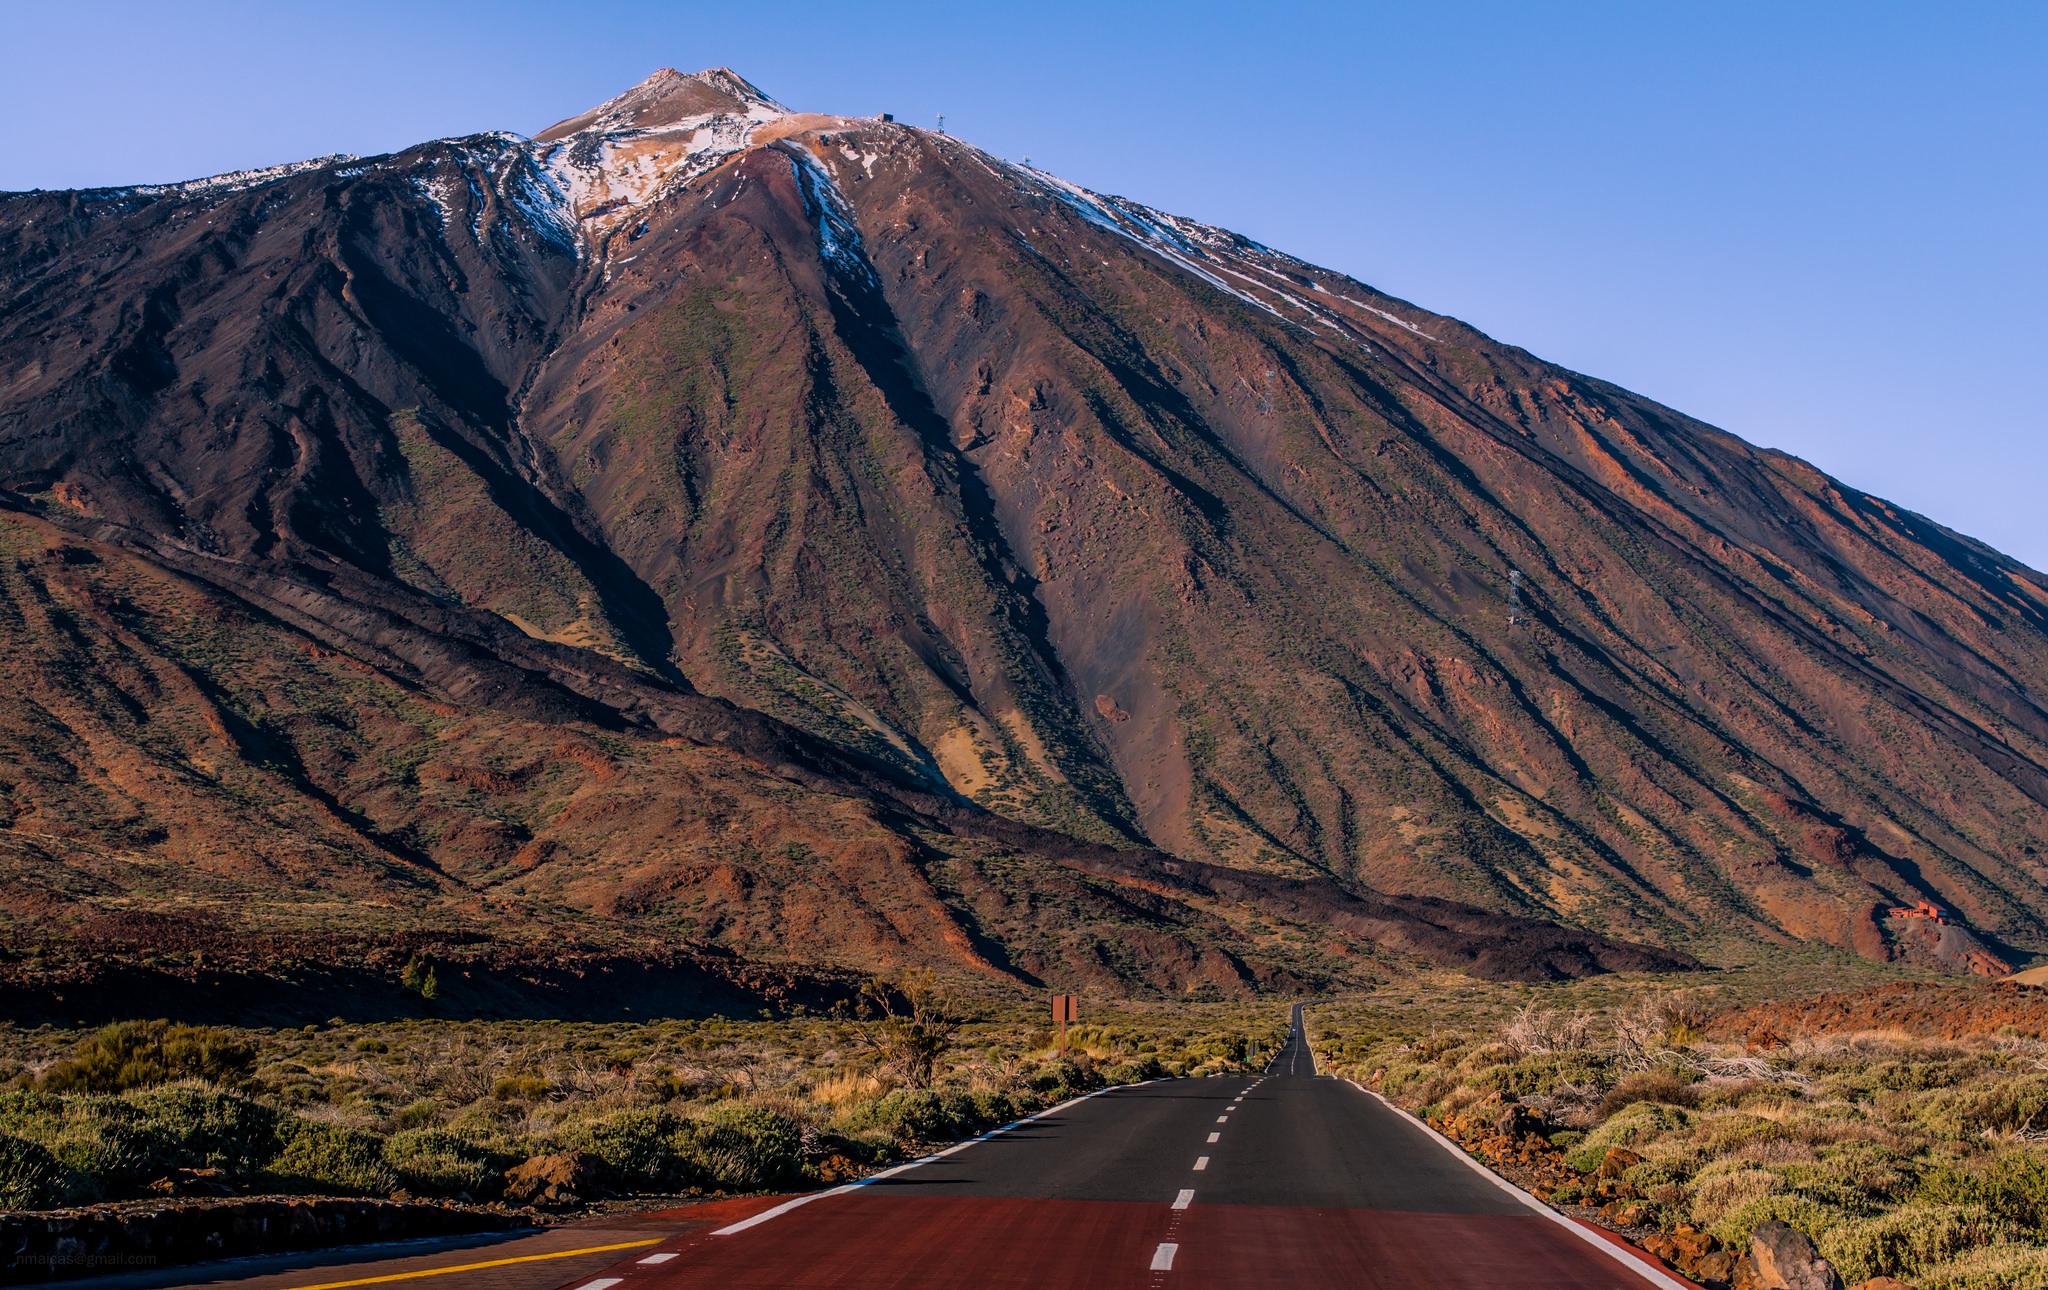 Teide, the volcano on Tenerife Island